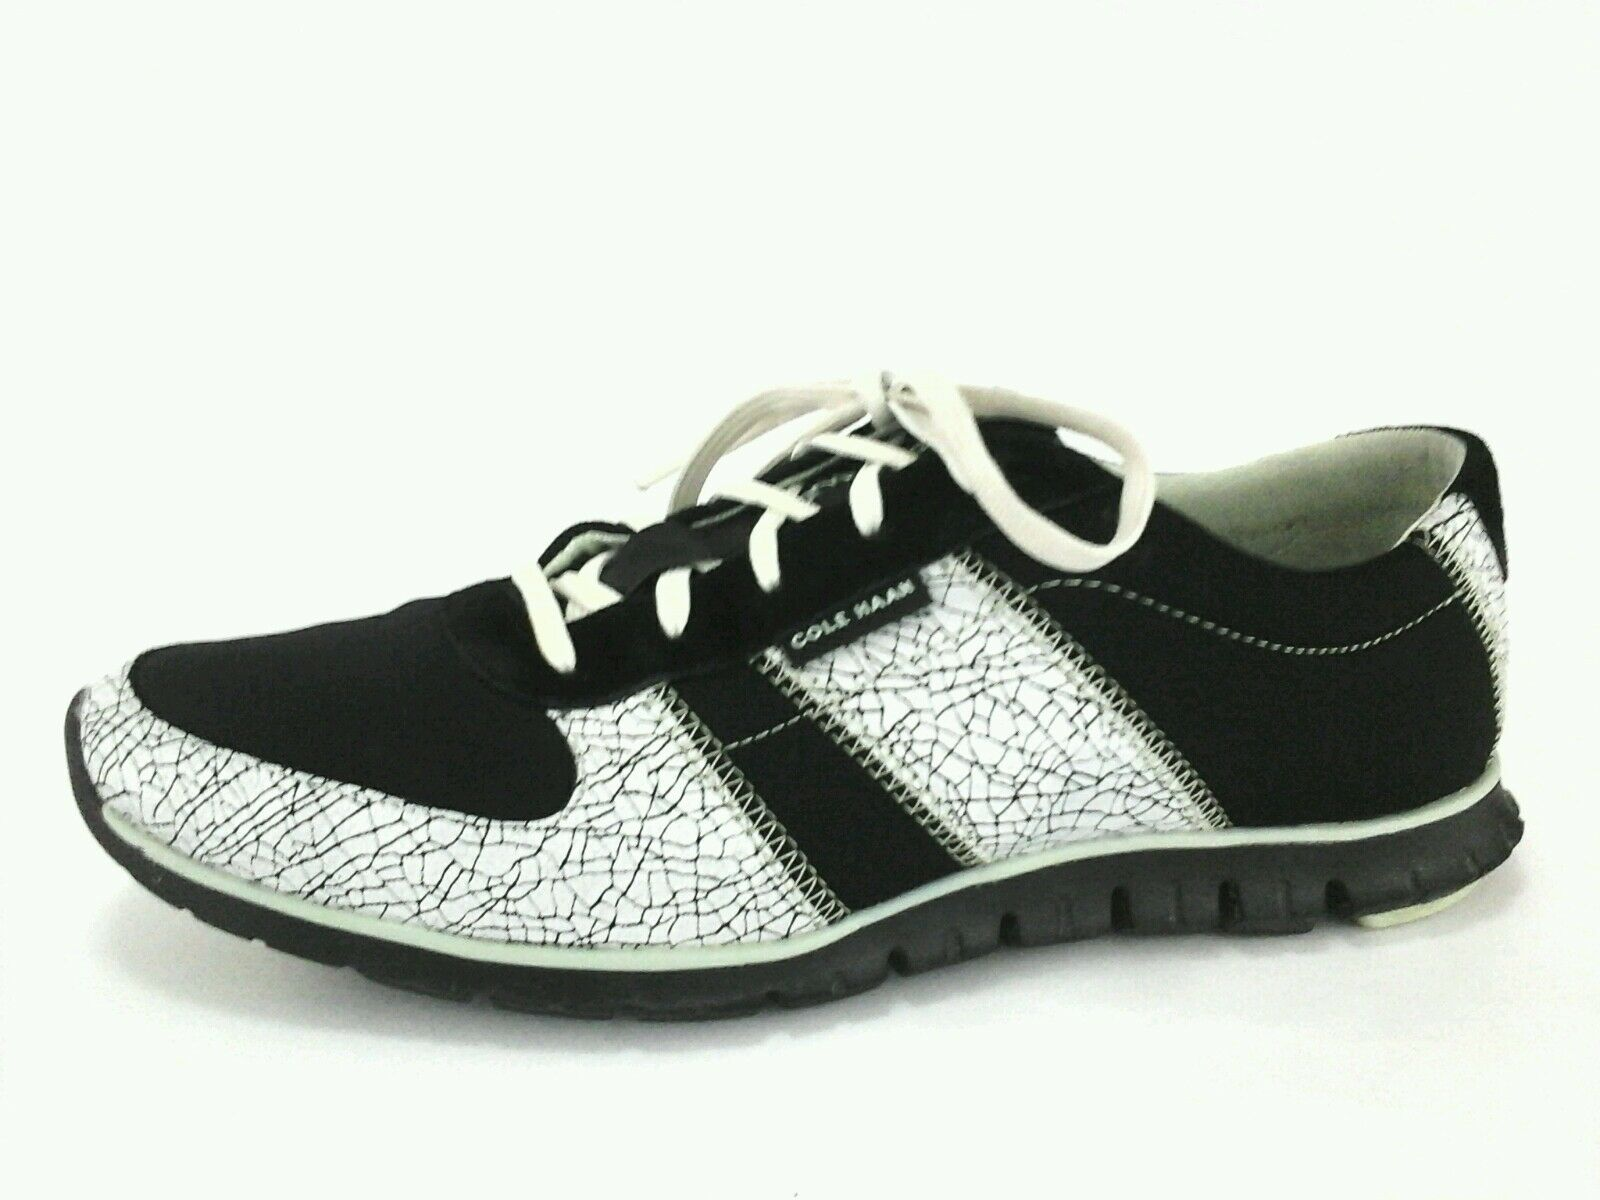 COLE HAAN ZERO GRAND chaussures Casual blanc sneakers noir blanc Casual femmes 9.5 EU 40 160 2a0ae7